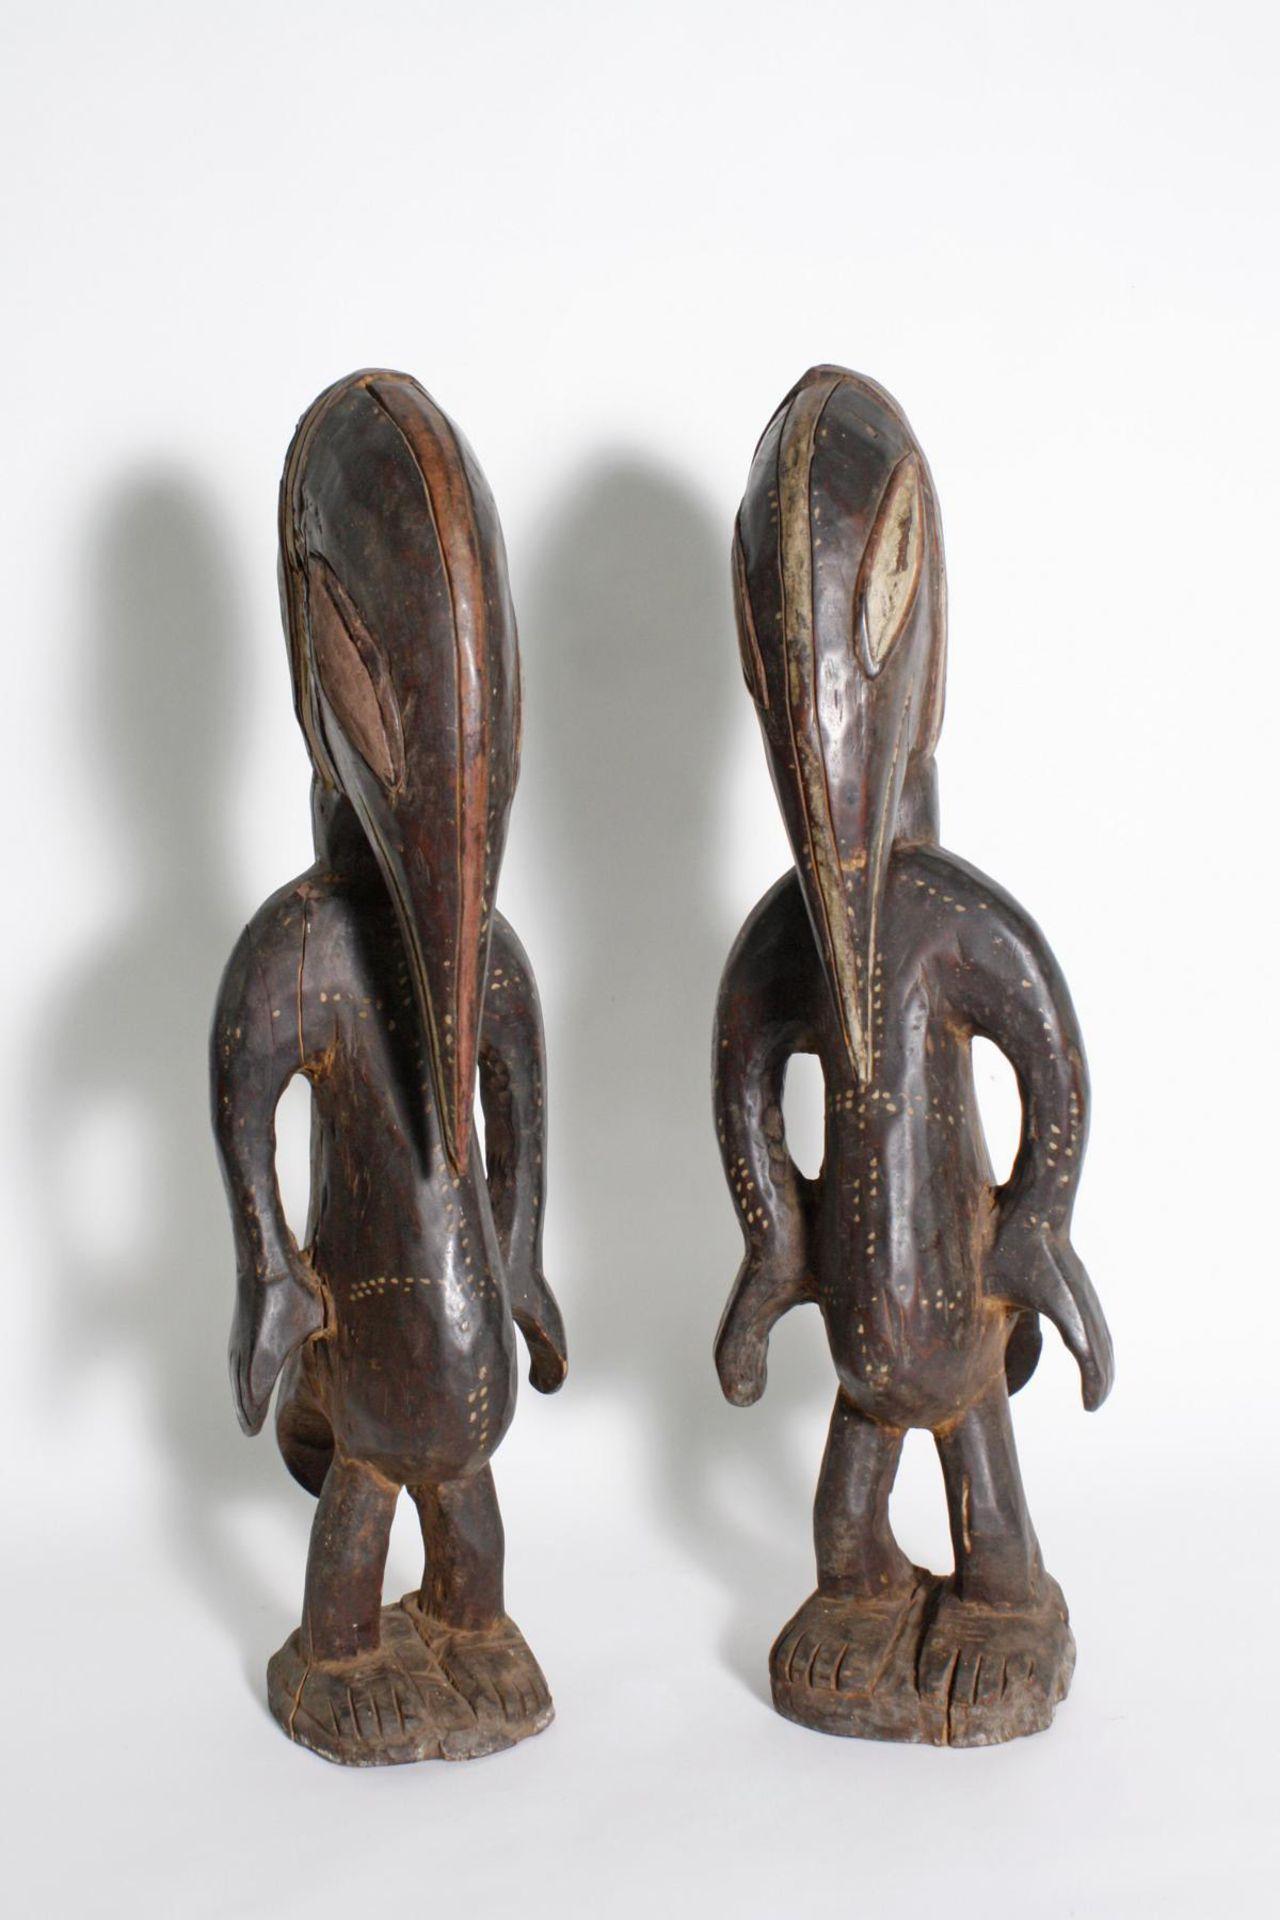 Figurenpaar, Calao , Senufo, Elfenbeinküste, 1. Hälfte 20. Jh.